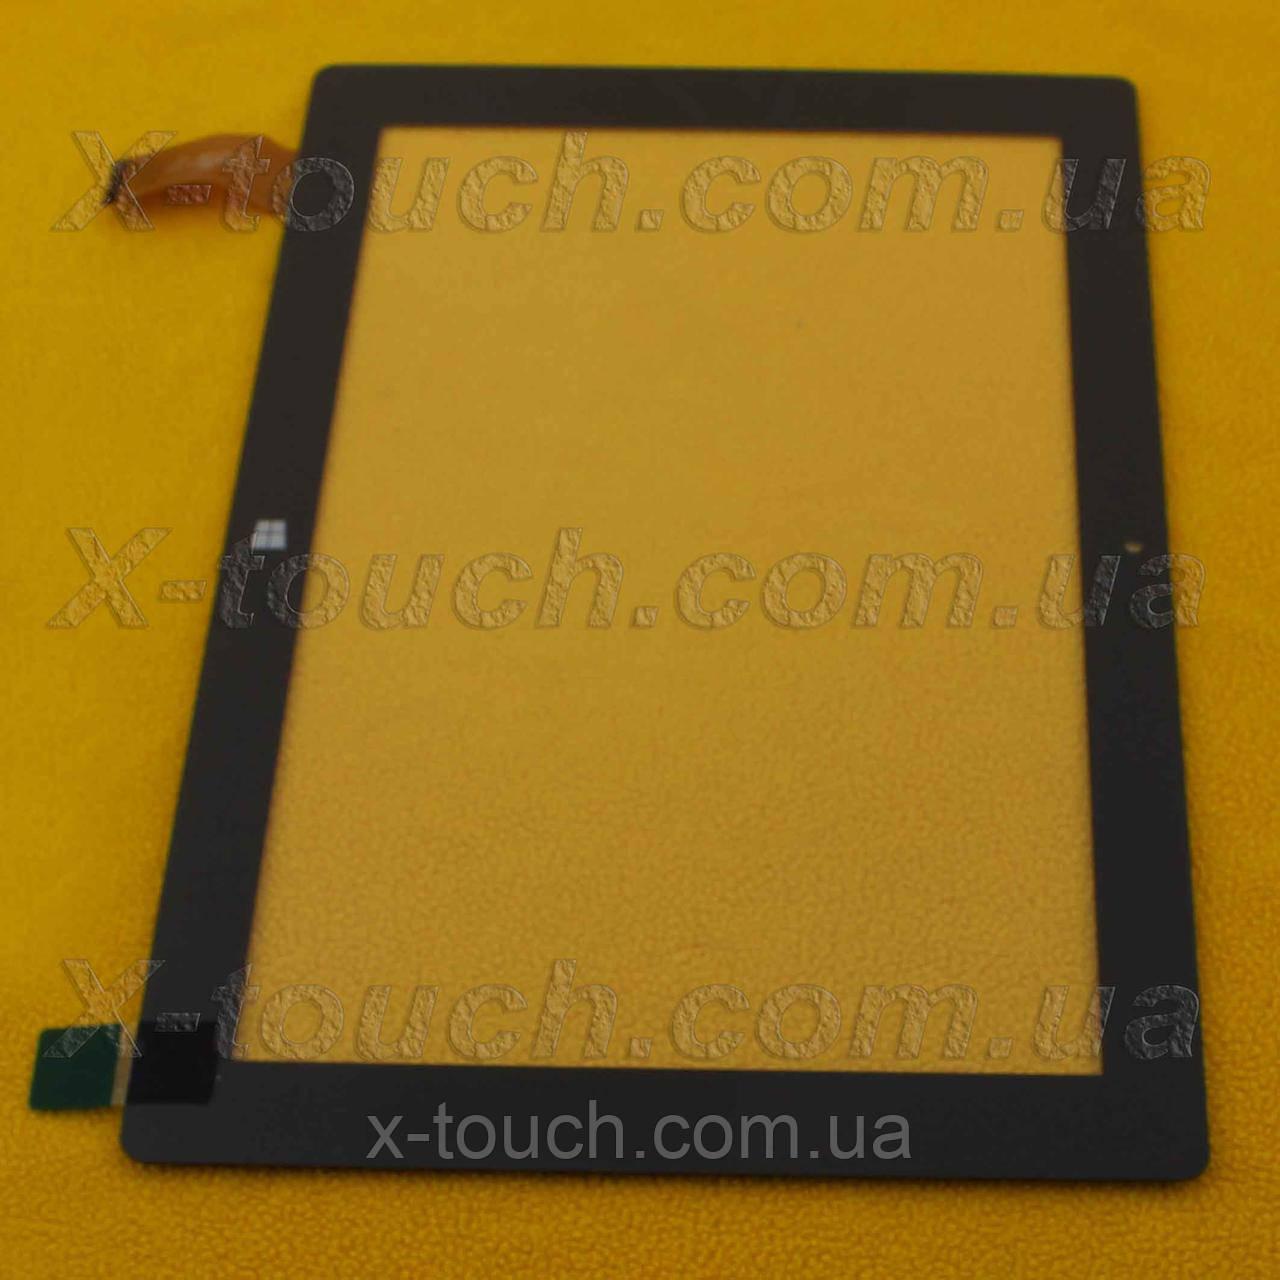 Тачскрин, сенсор FPC-FC101JS124-03 для планшета